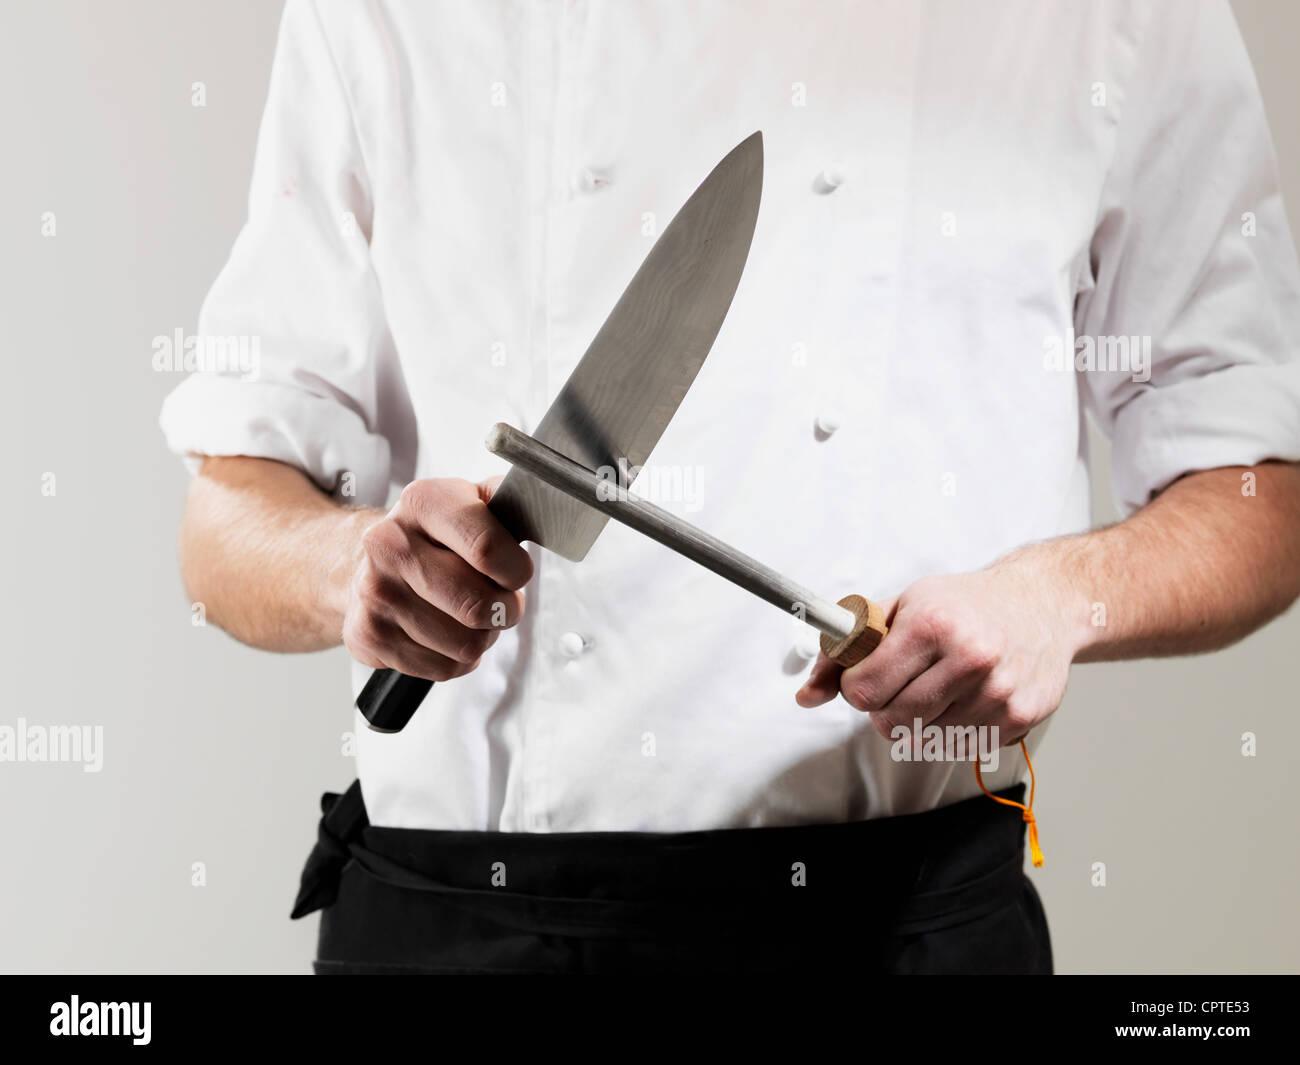 Chef sharpening knife against white background - Stock Image